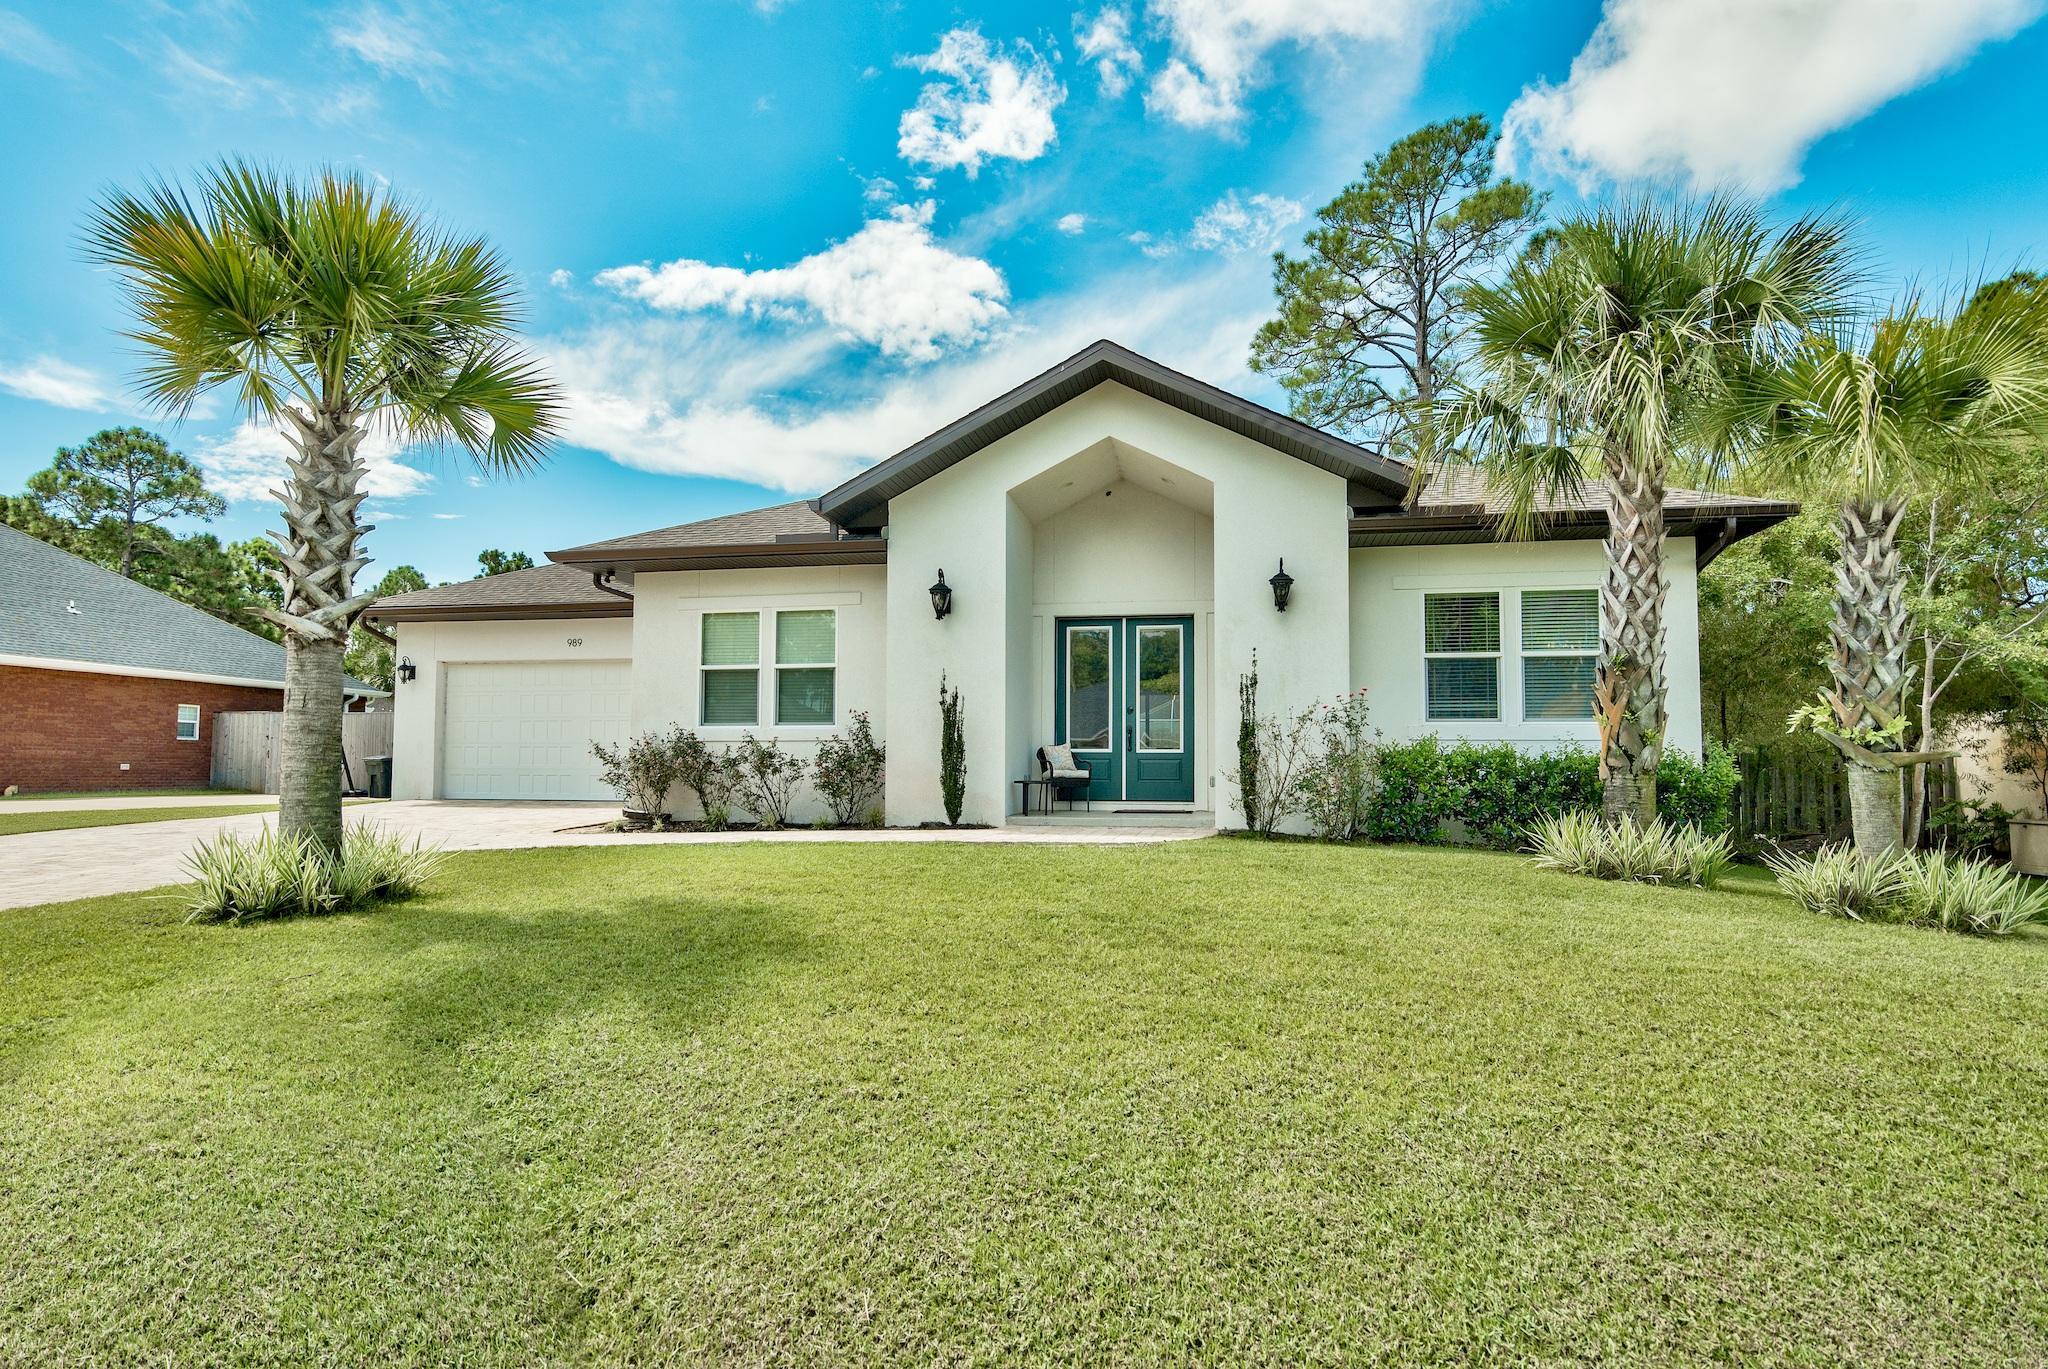 8842 St Andrews Dr, Miramar Beach, FL, 32550